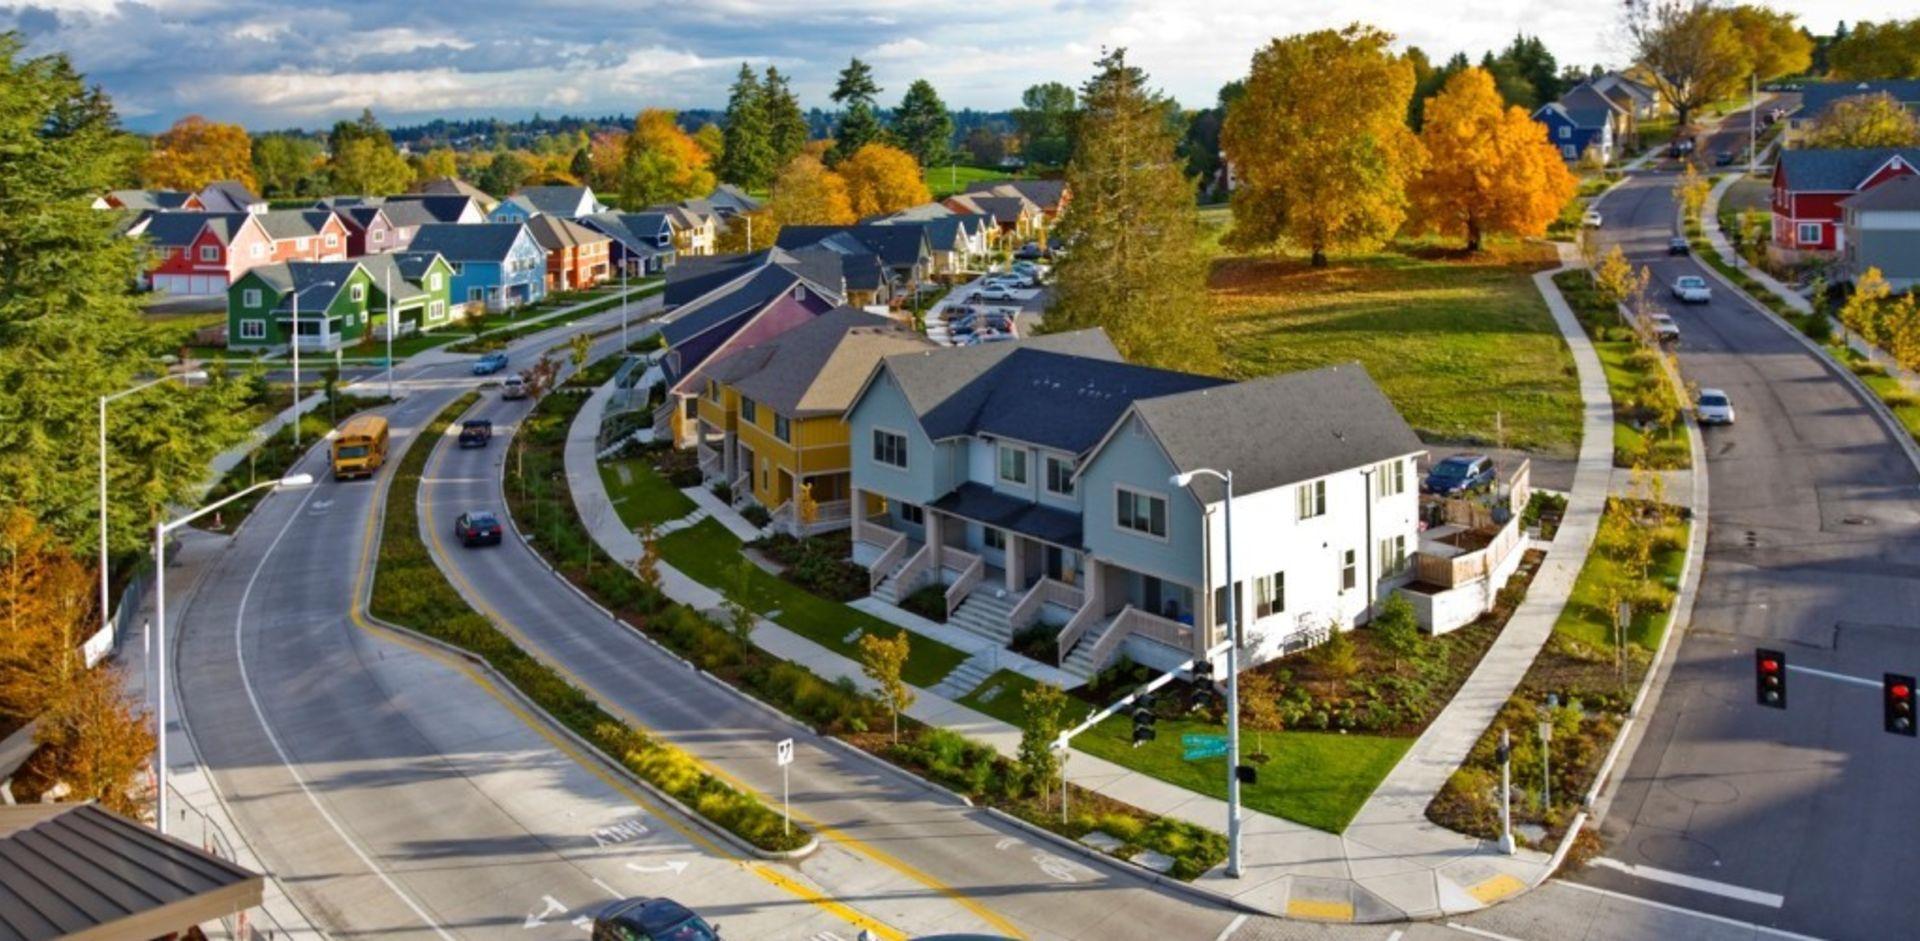 Choosing the Best Neighborhood for You